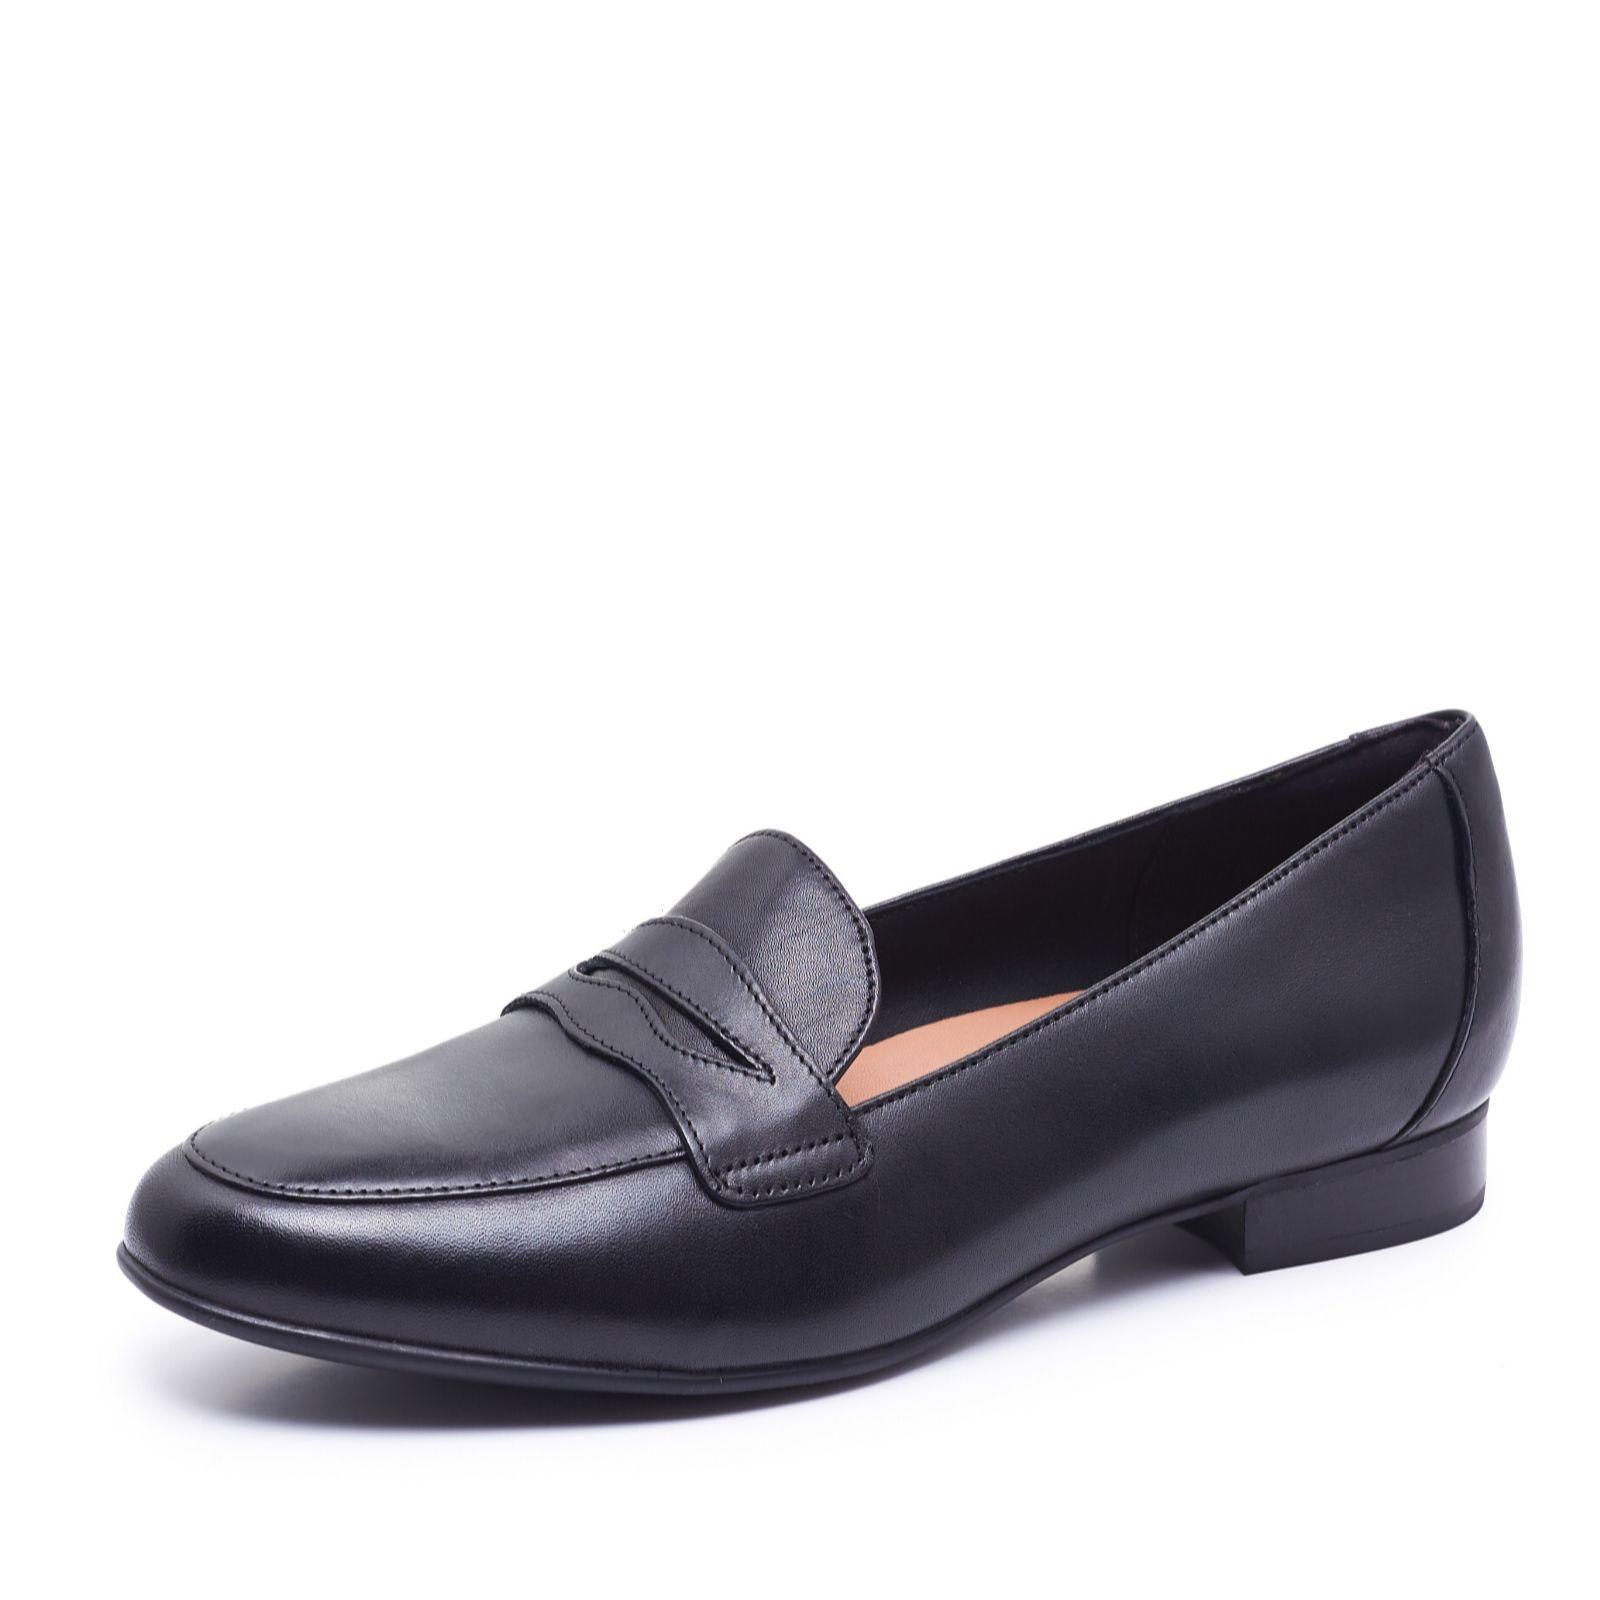 17e88a83613 Clarks Un Blush Go Unlined Loafer Standard Fit - QVC UK